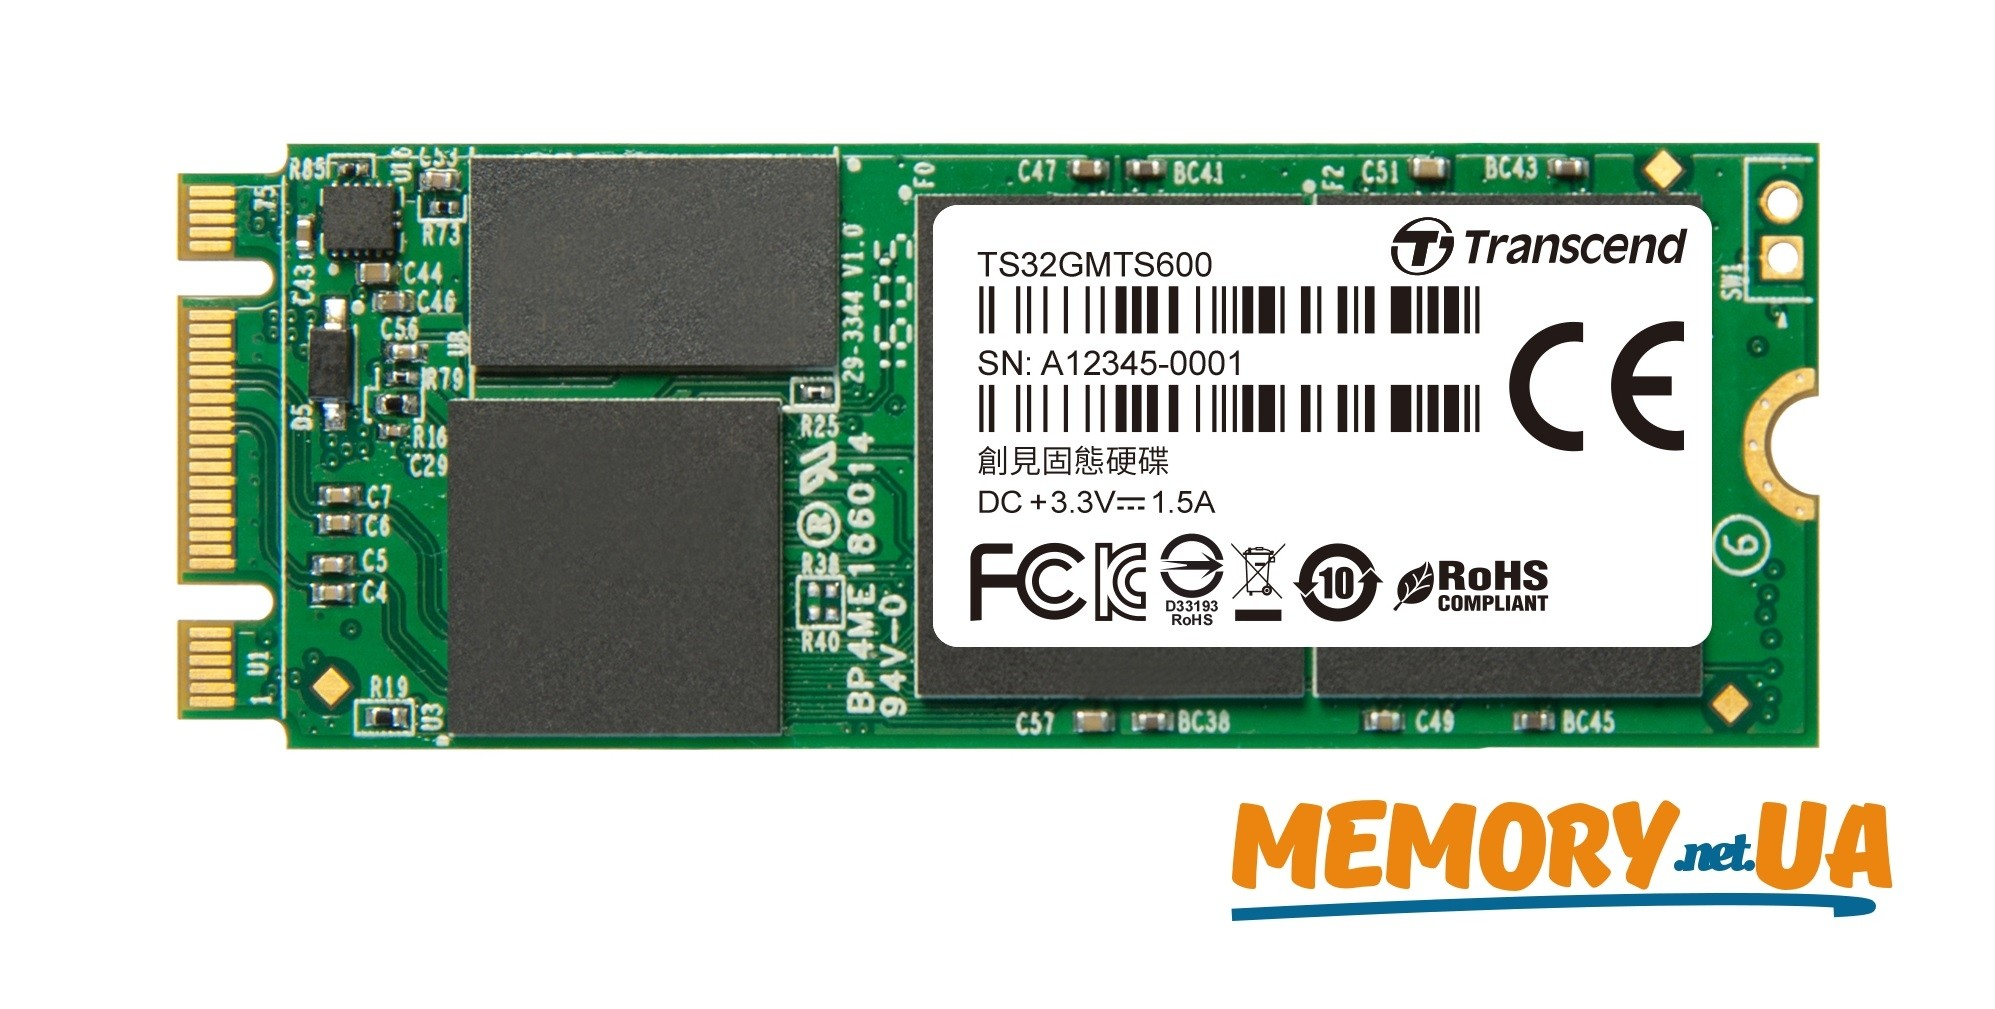 Transcend 32GB SSD M.2 2260 MTS600 MLC